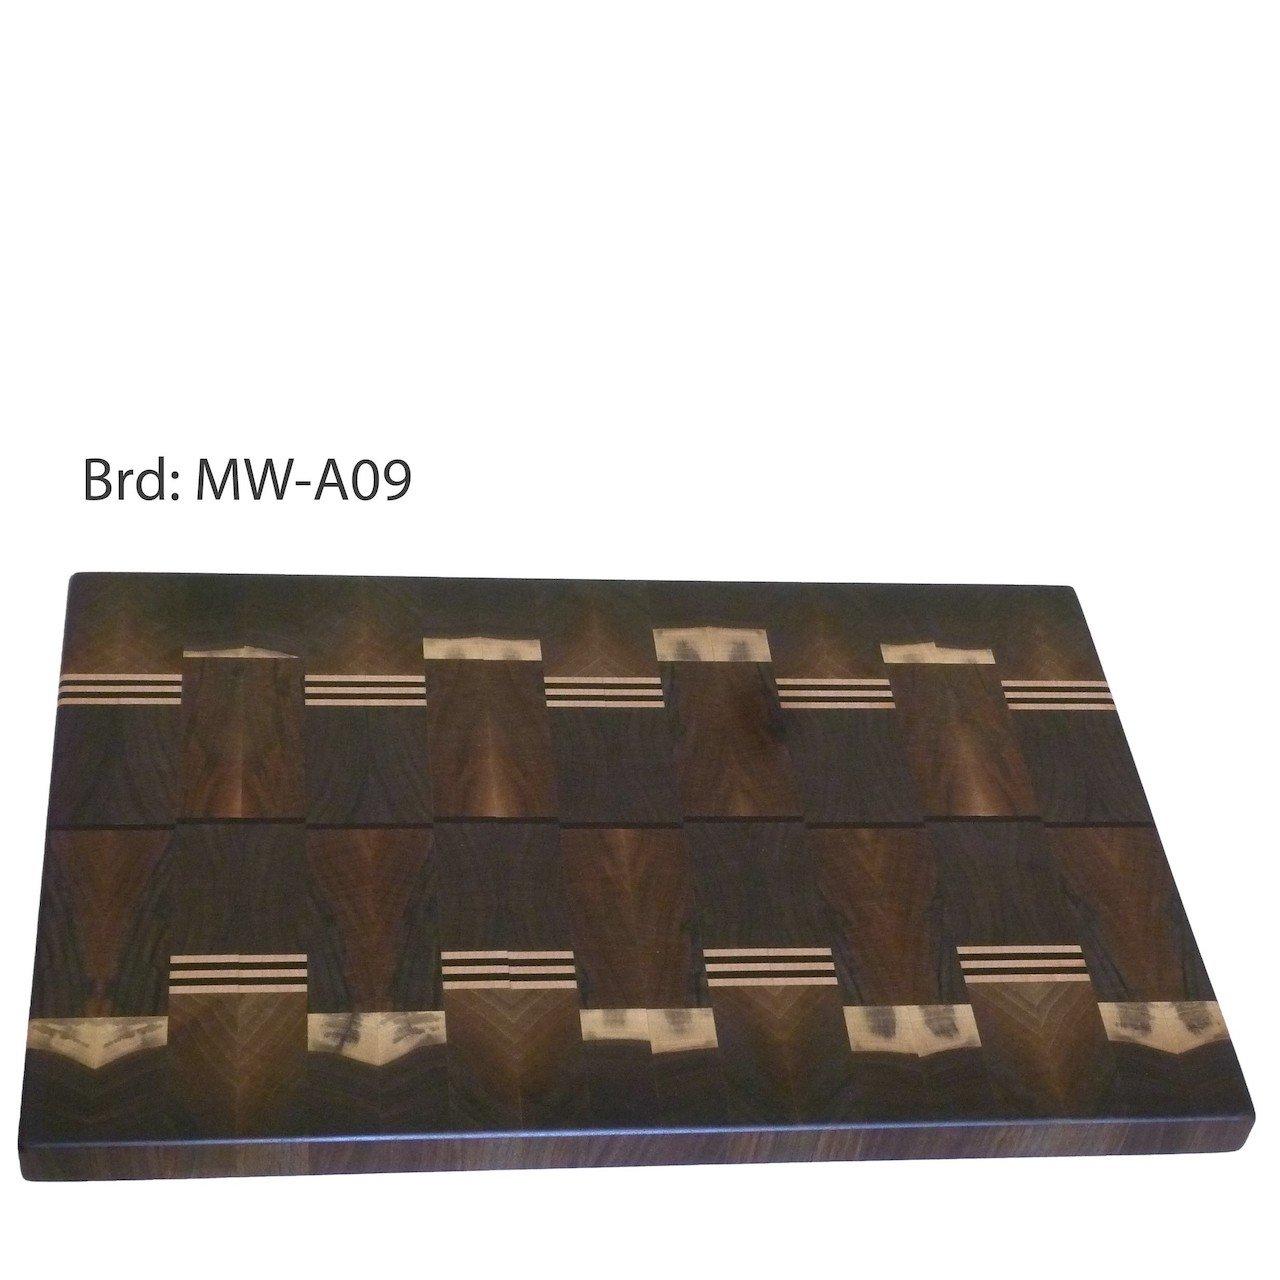 MW-A09